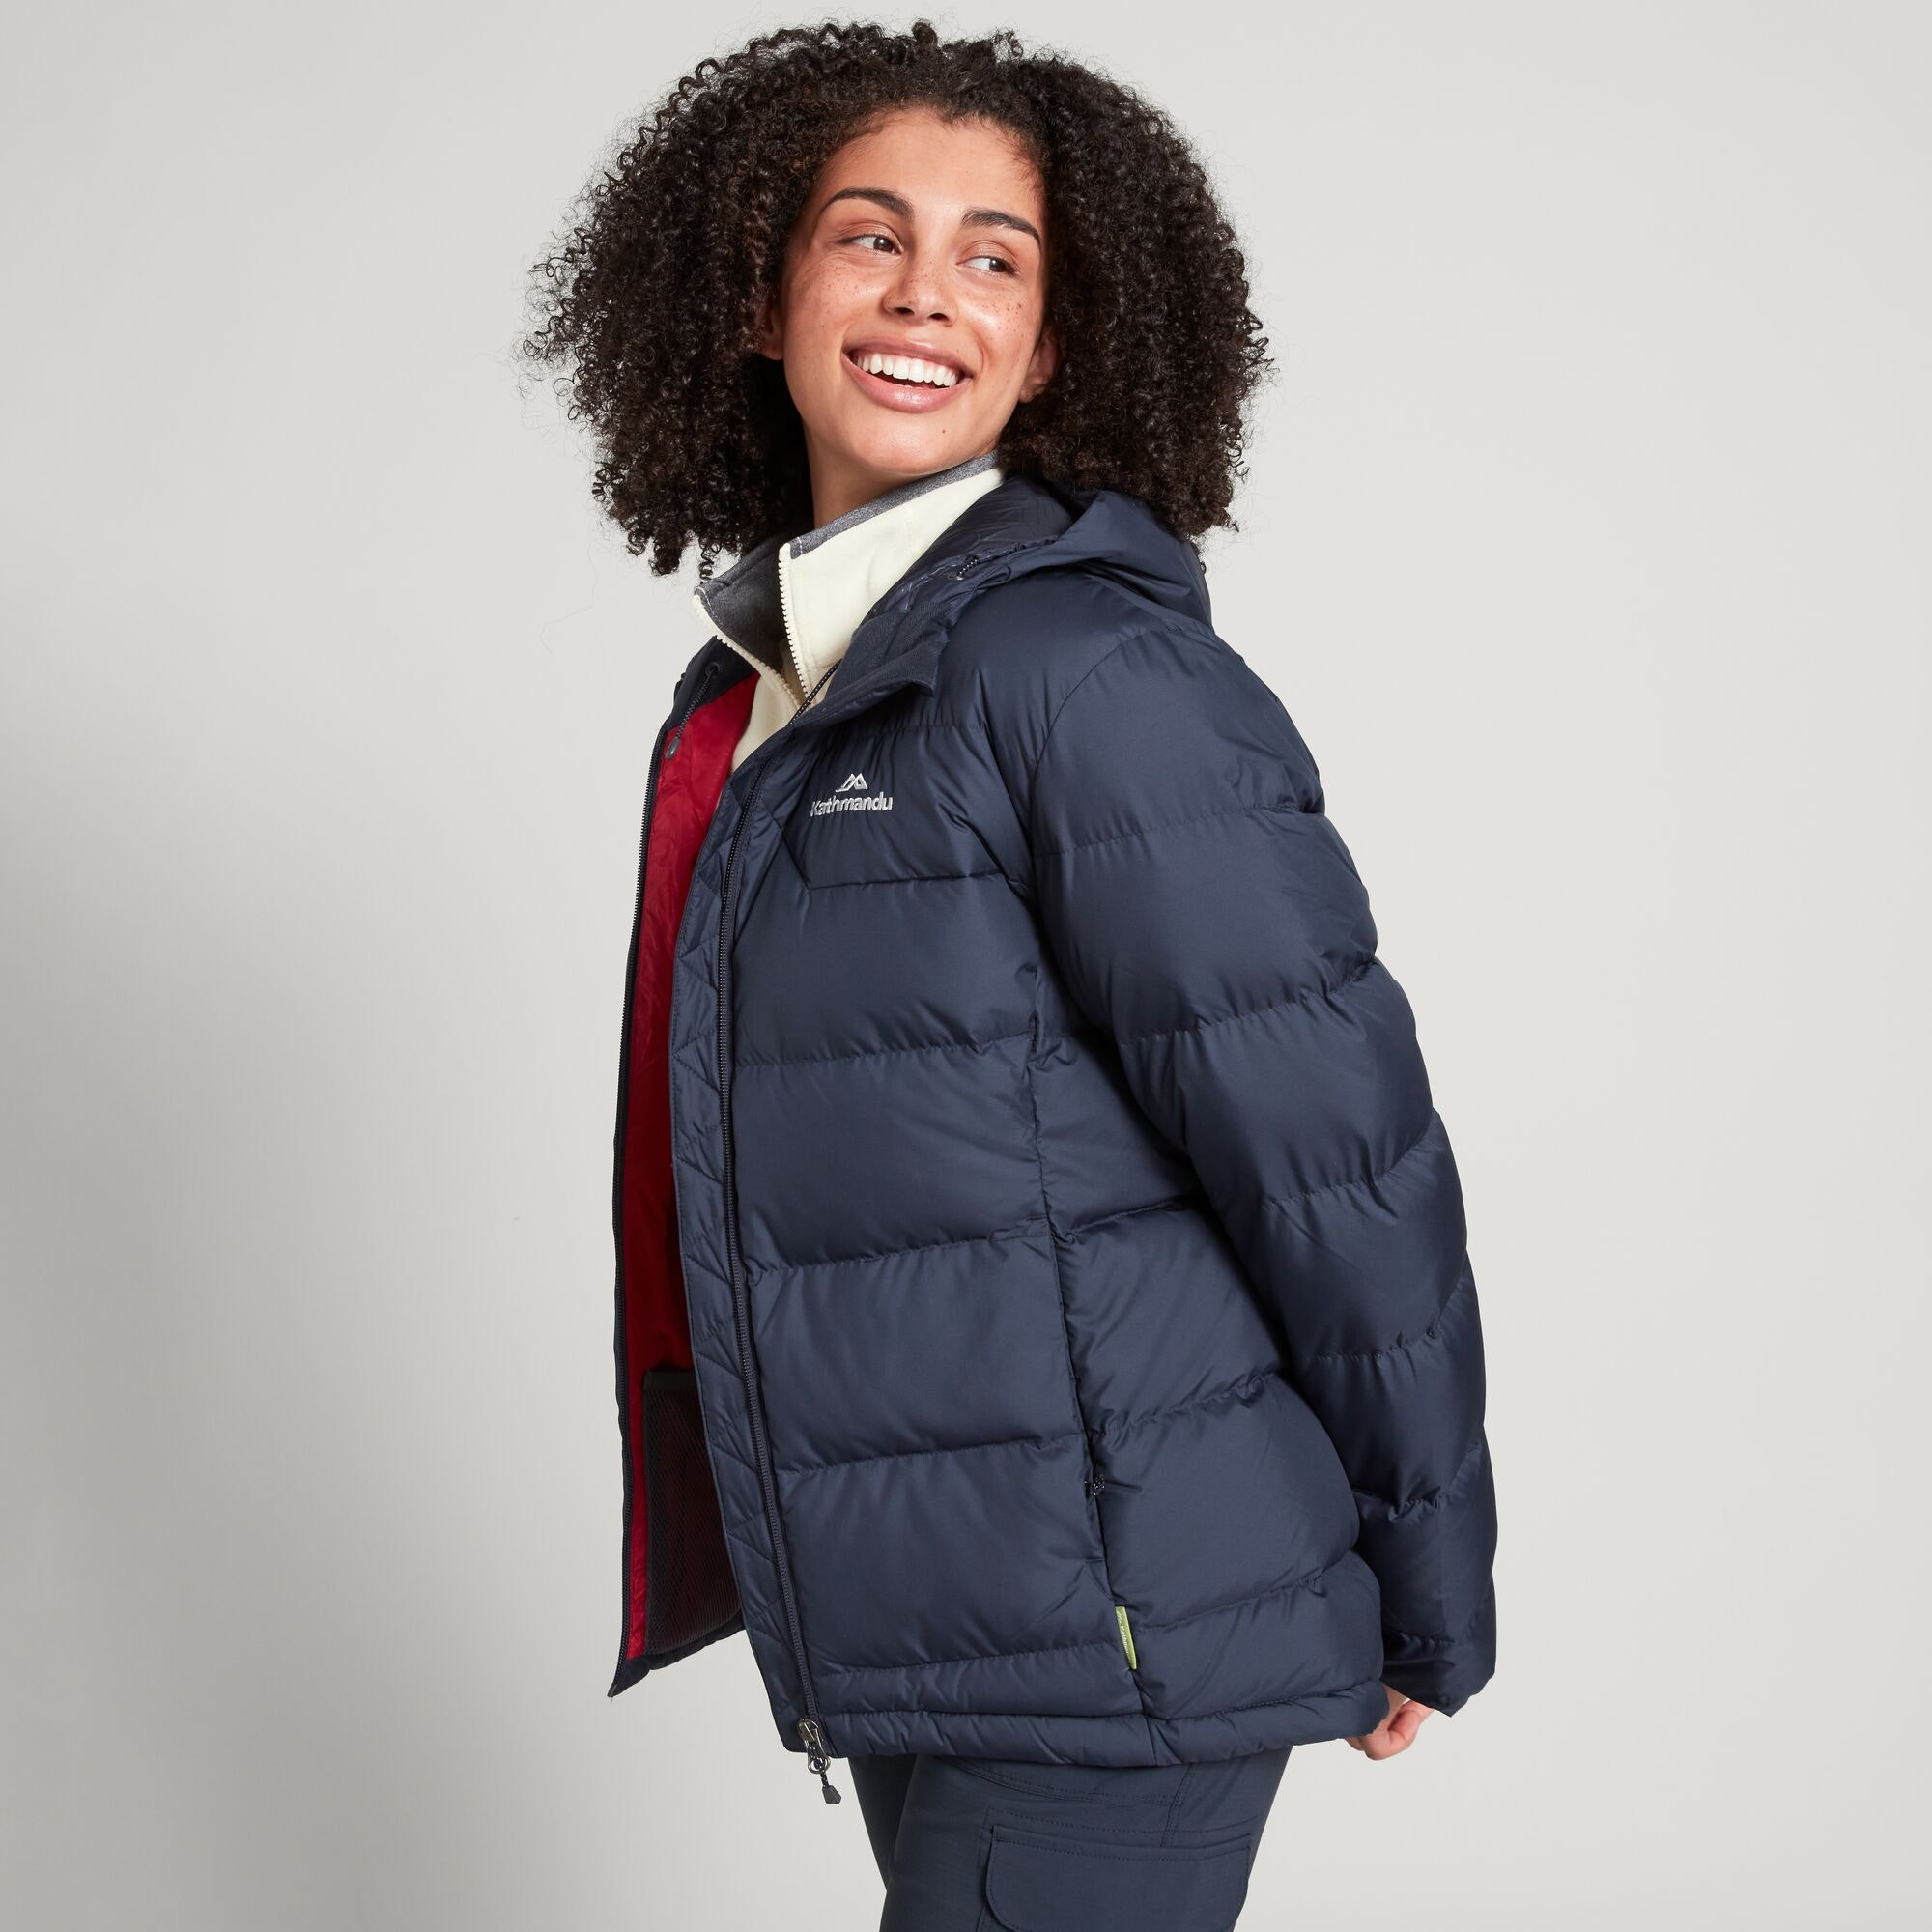 thumbnail 16 - NEW Kathmandu Epiq Womens Hooded Down Puffer 600 Fill Warm Outdoor Winter Jacket